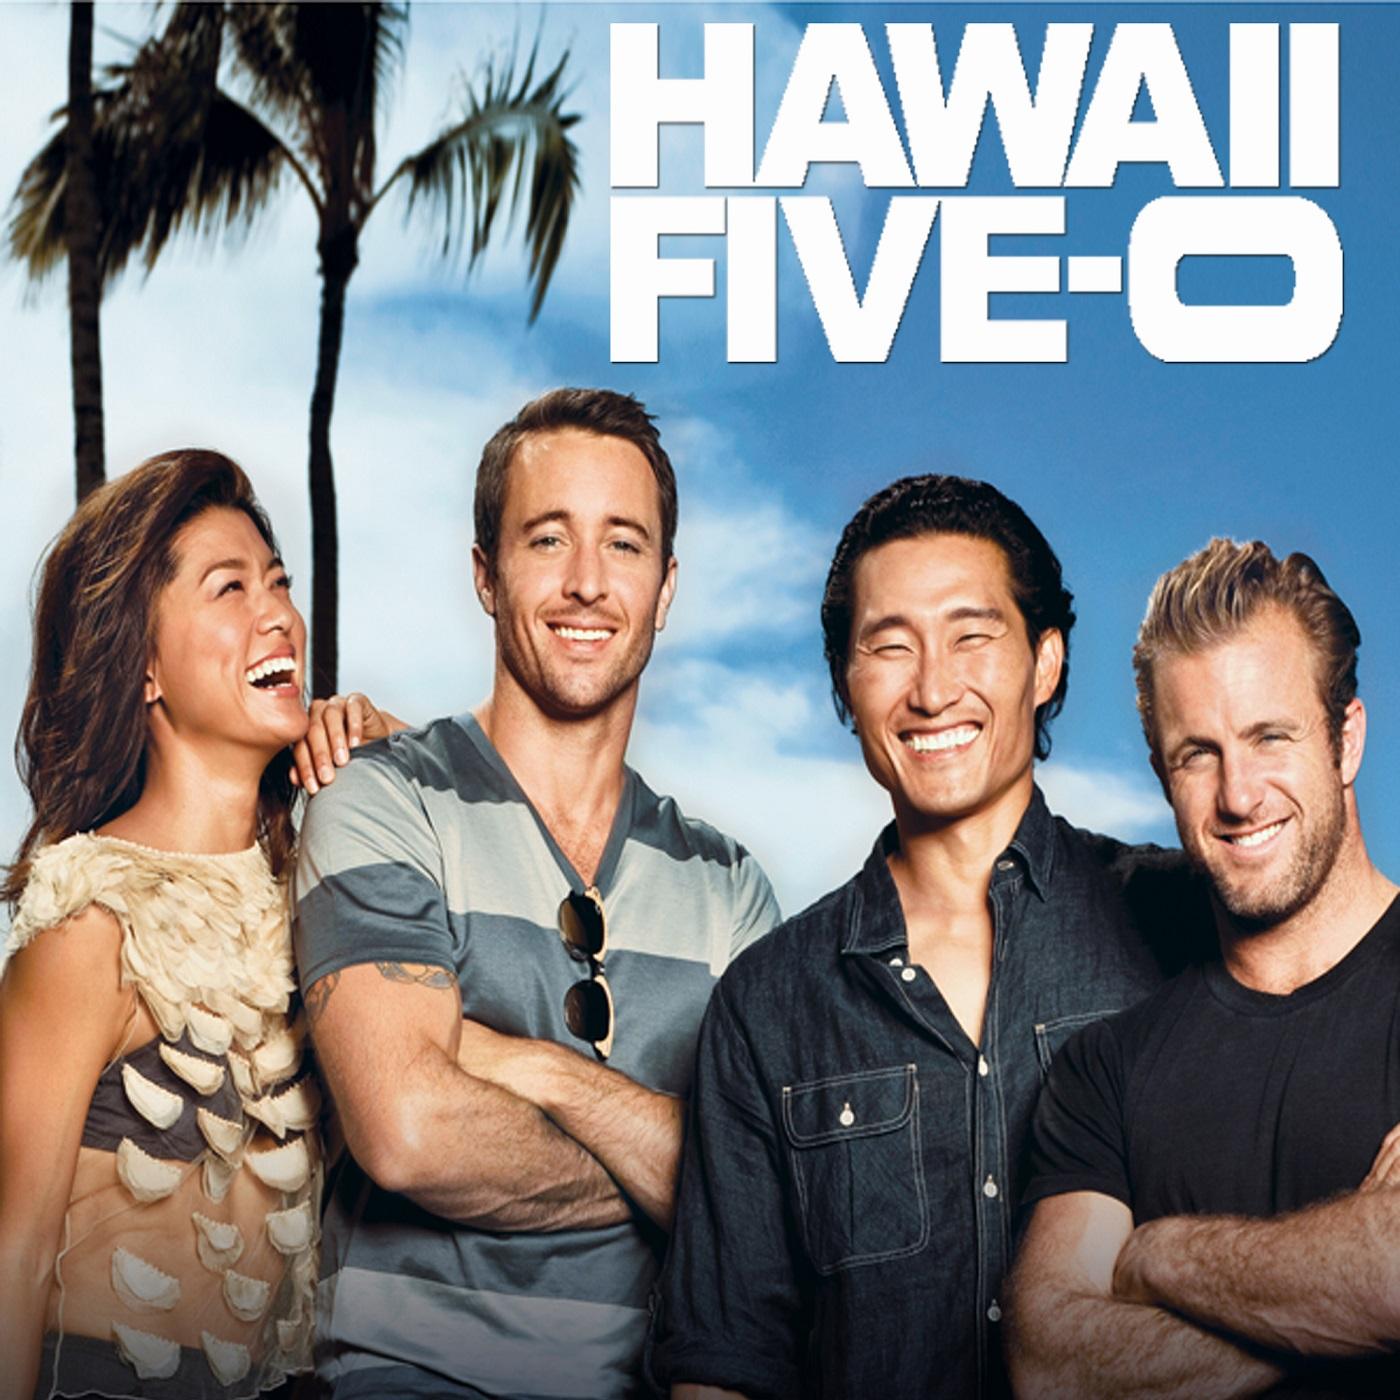 Hawaii Five-0 S01-05 | S05E01-E16 HDTV | 720P Qp62